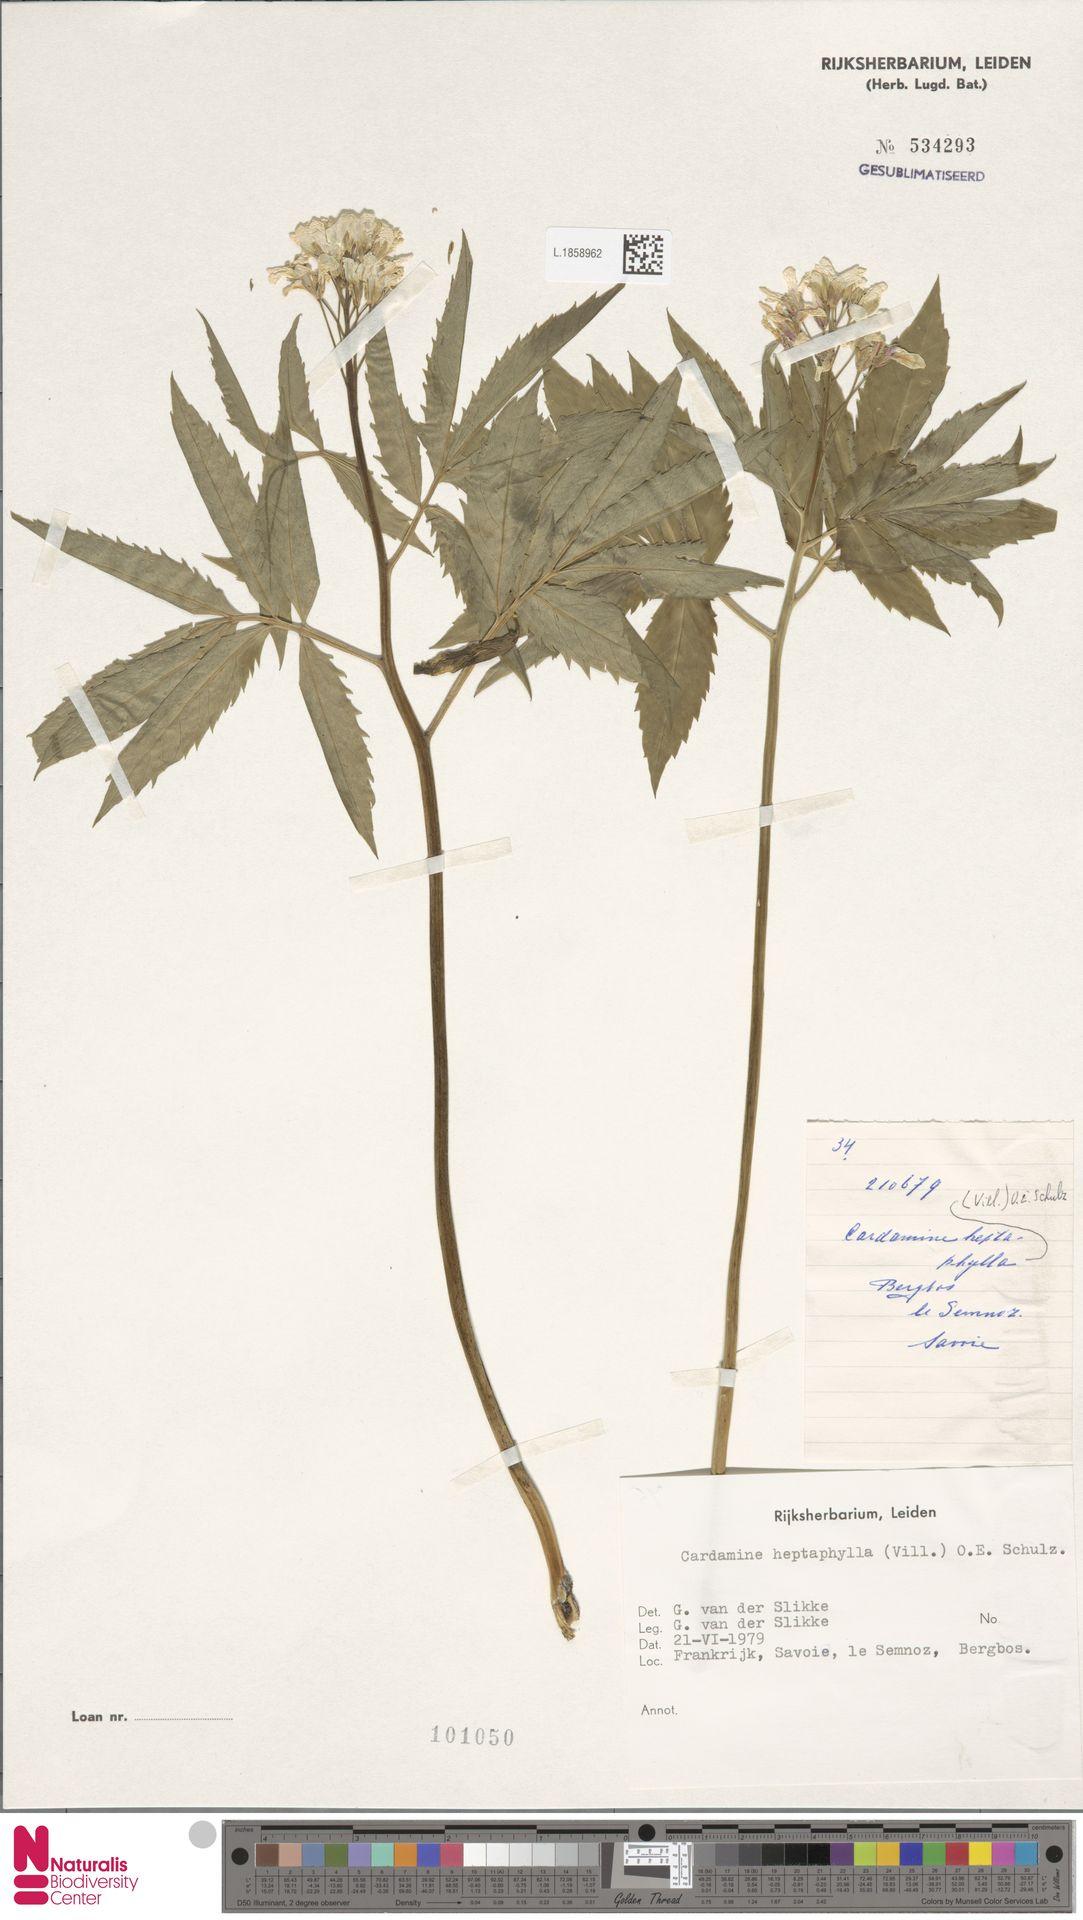 L.1858962   Cardamine heptaphylla (Vill.) O.E.Schulz